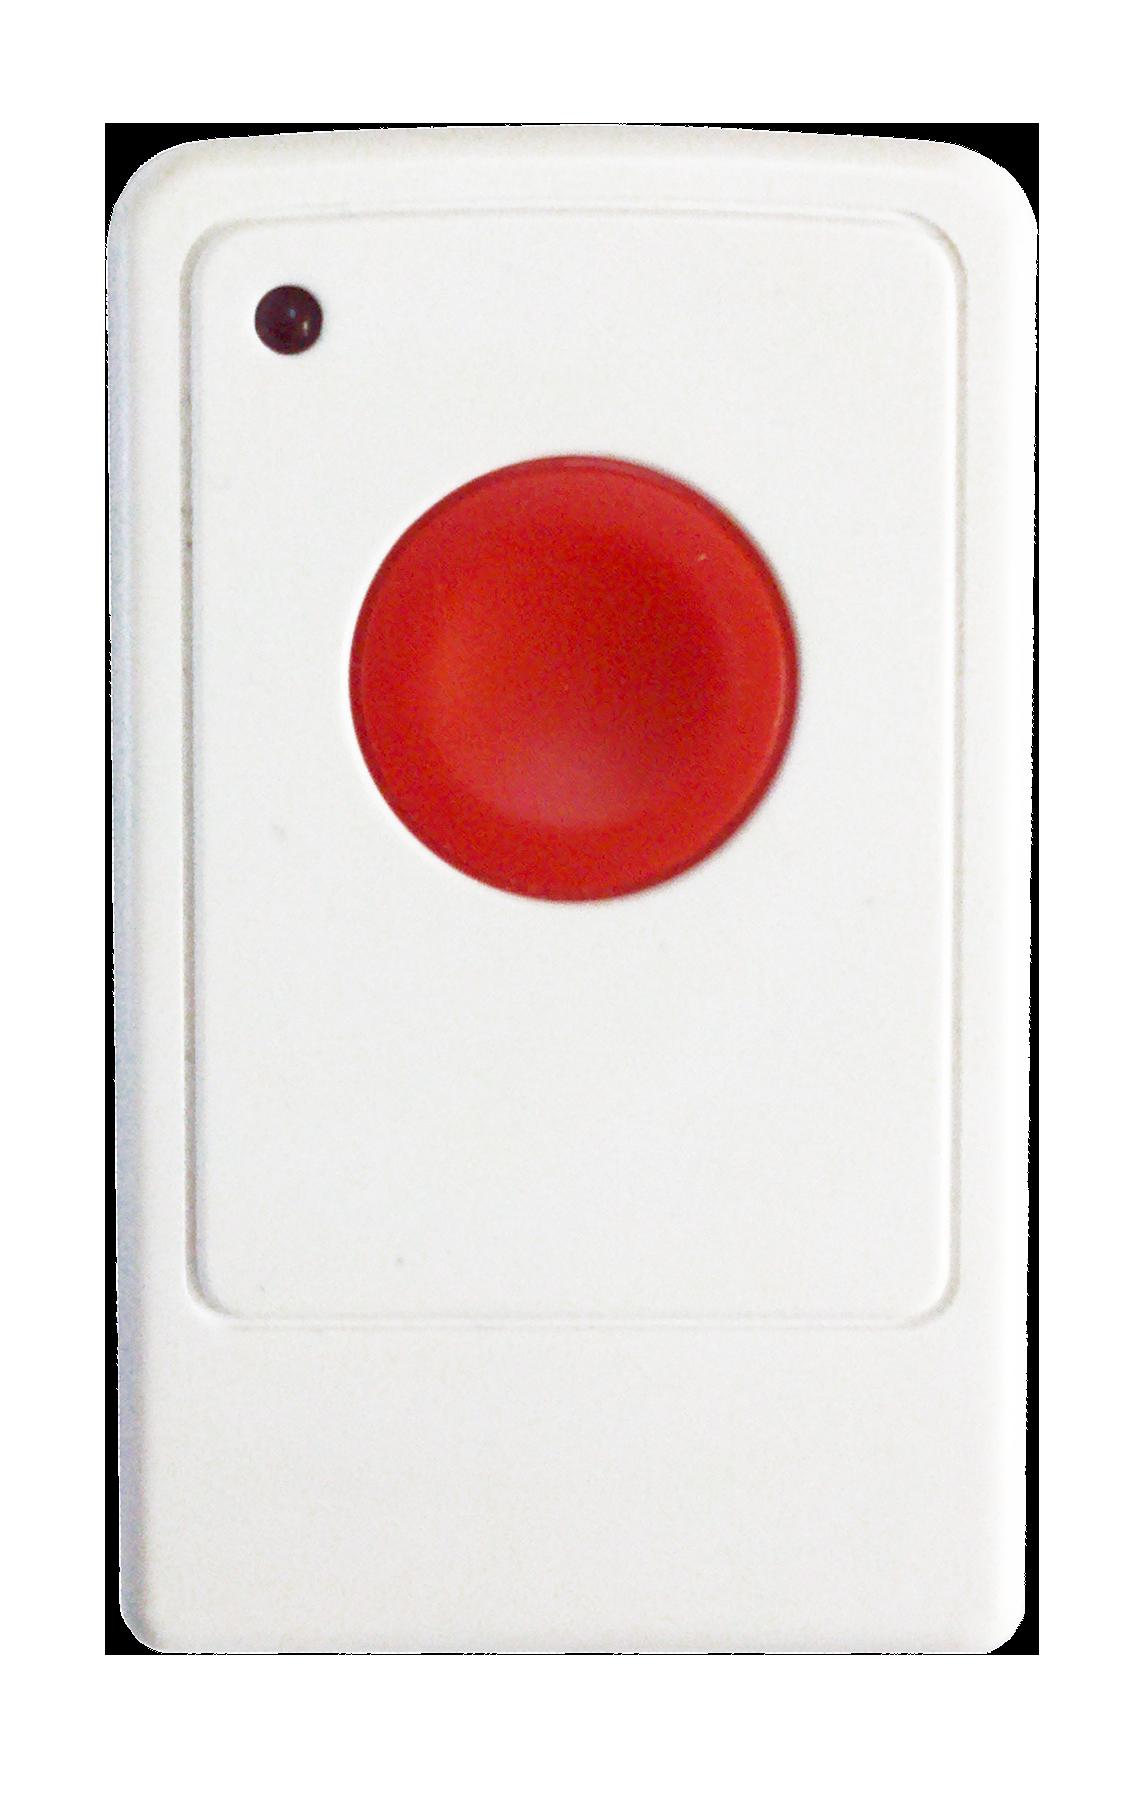 Multi-Use Push Button